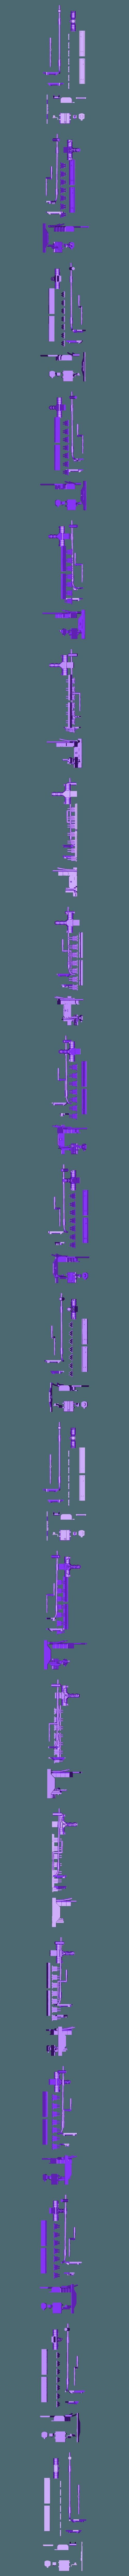 the_set.stl Download free STL file Deagostini Millennium Falcon Missing parts set • 3D printing template, boryelwoc